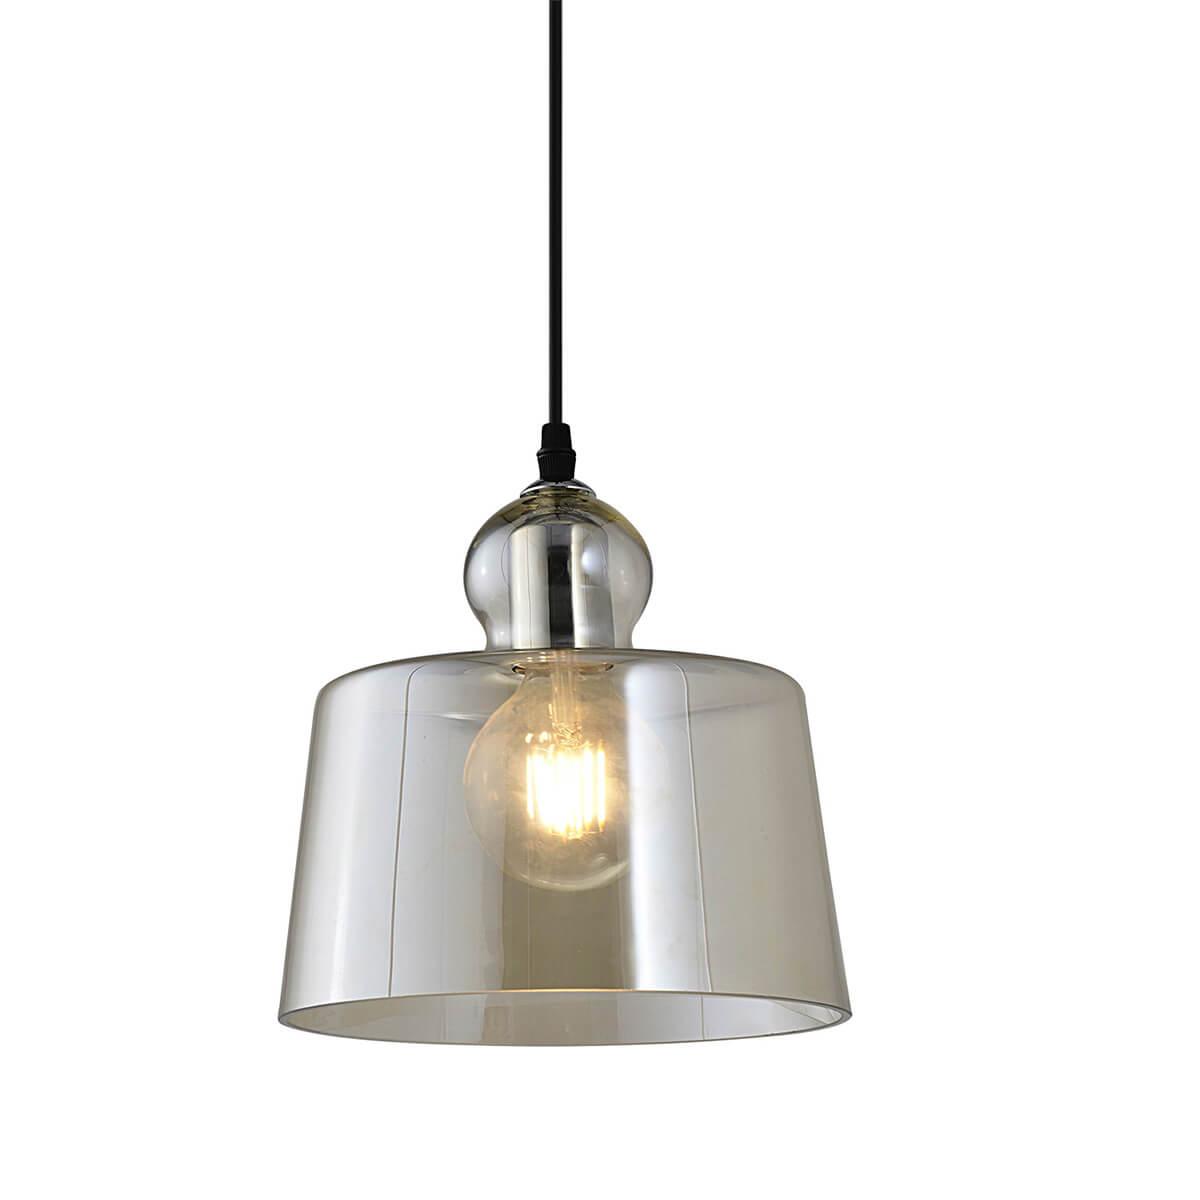 Lámpara Colgante | Almacenes Ortega Ruiz